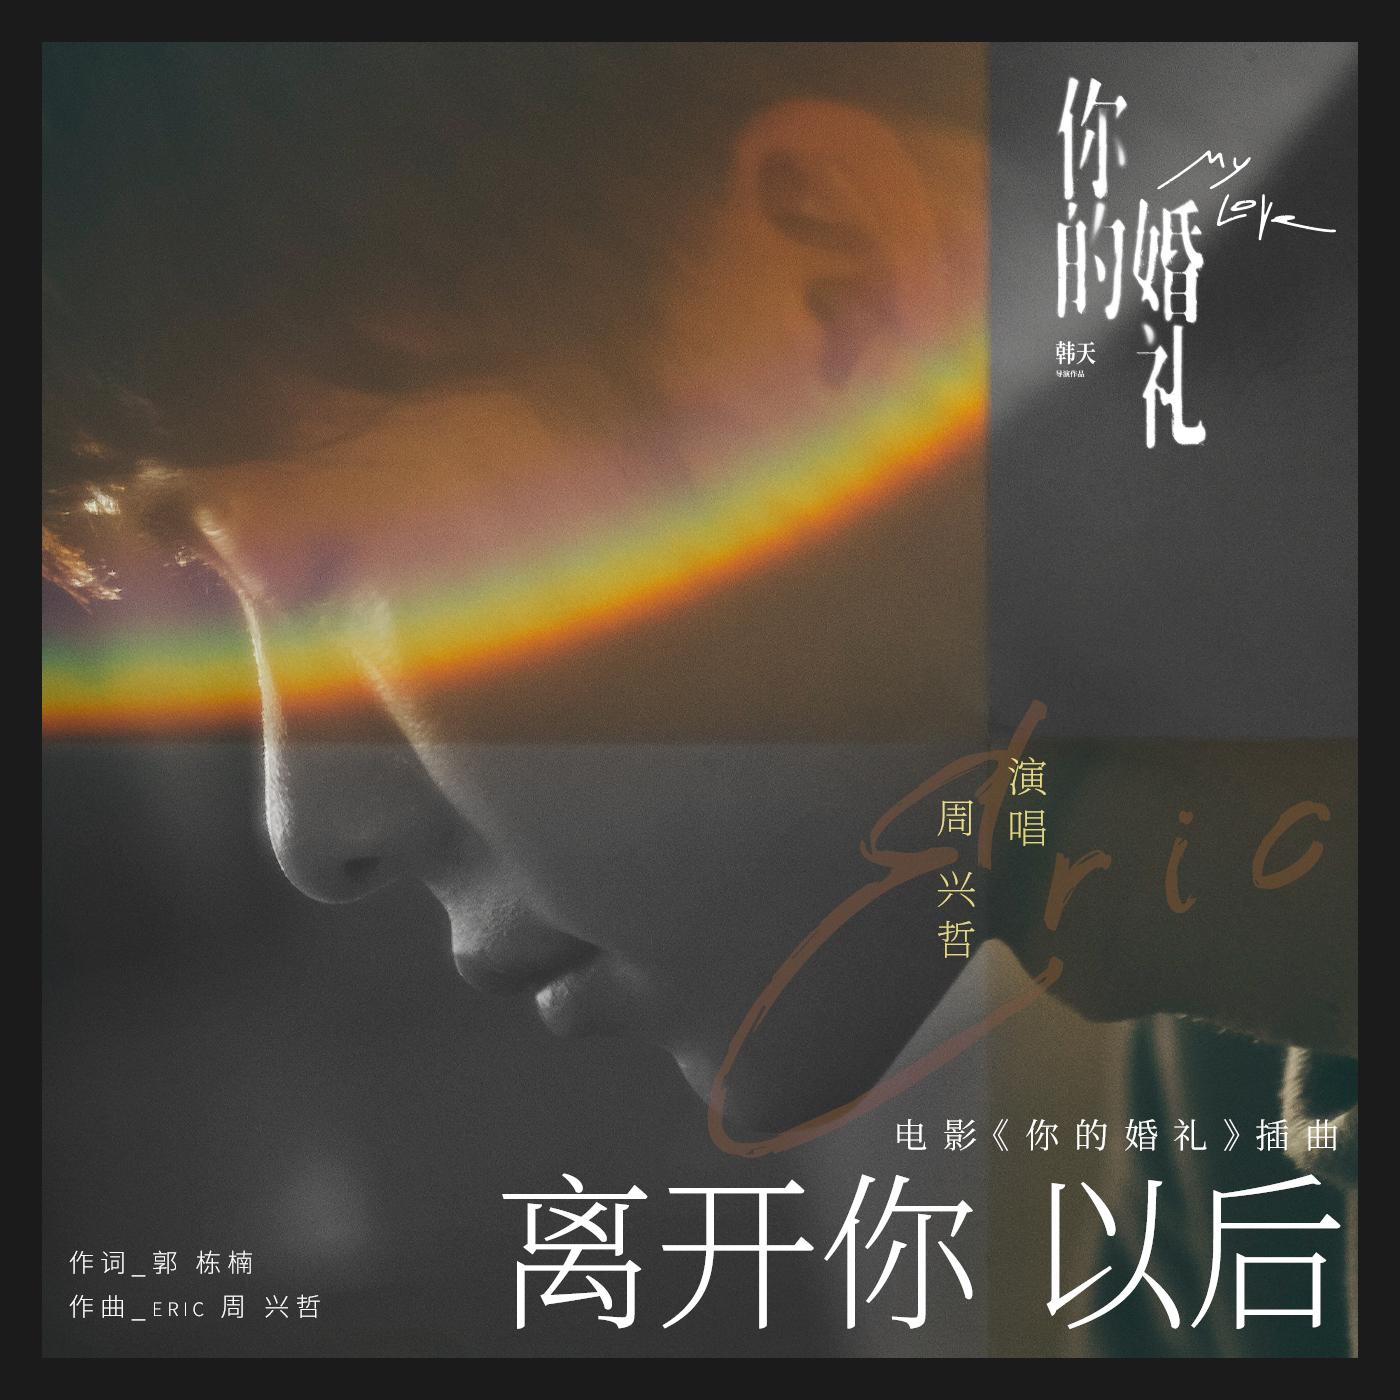 Eric Chou 周興哲 - Li Kai Ni Yi Hou 離開你以後 Lyrics 歌詞 Pinyin   周興哲 離開你以後 歌詞